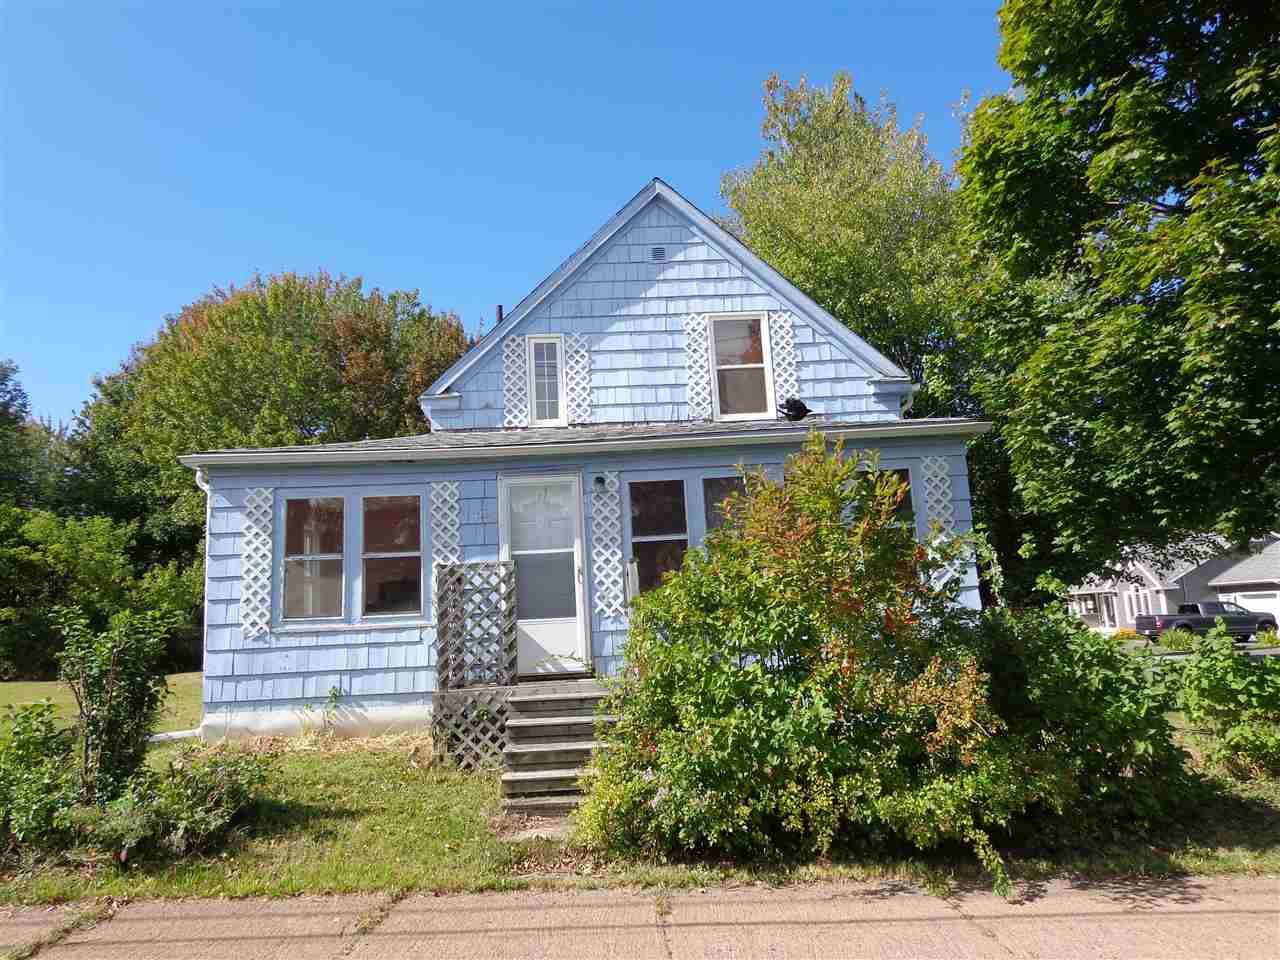 Main Photo: 69 Park Street in Trenton: 107-Trenton,Westville,Pictou Residential for sale (Northern Region)  : MLS®# 202019710